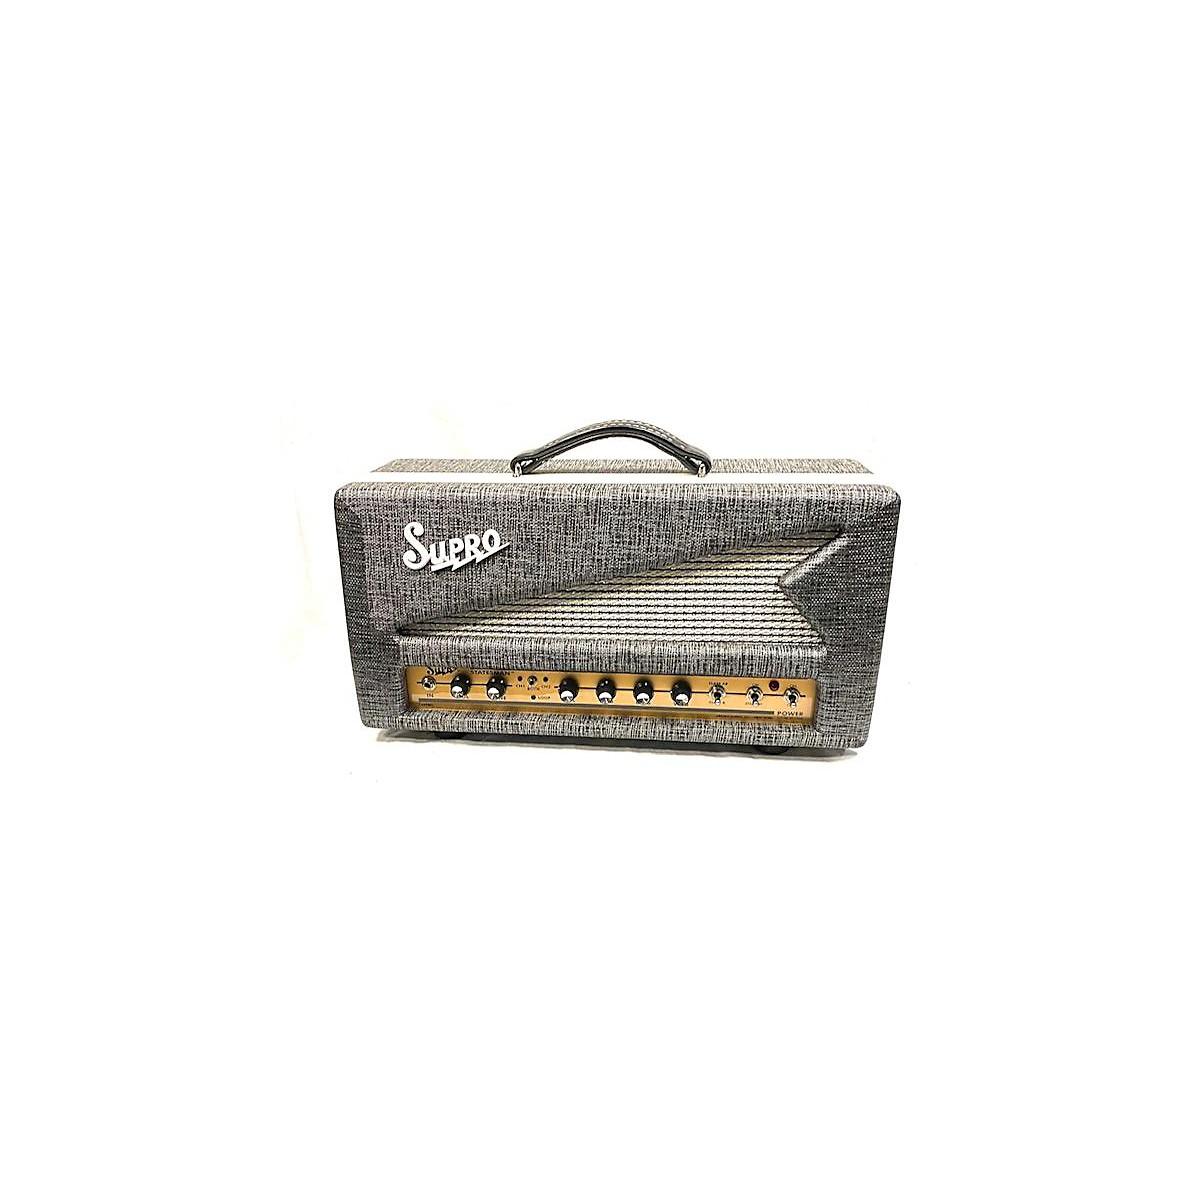 Supro 1699rh Tube Guitar Amp Head